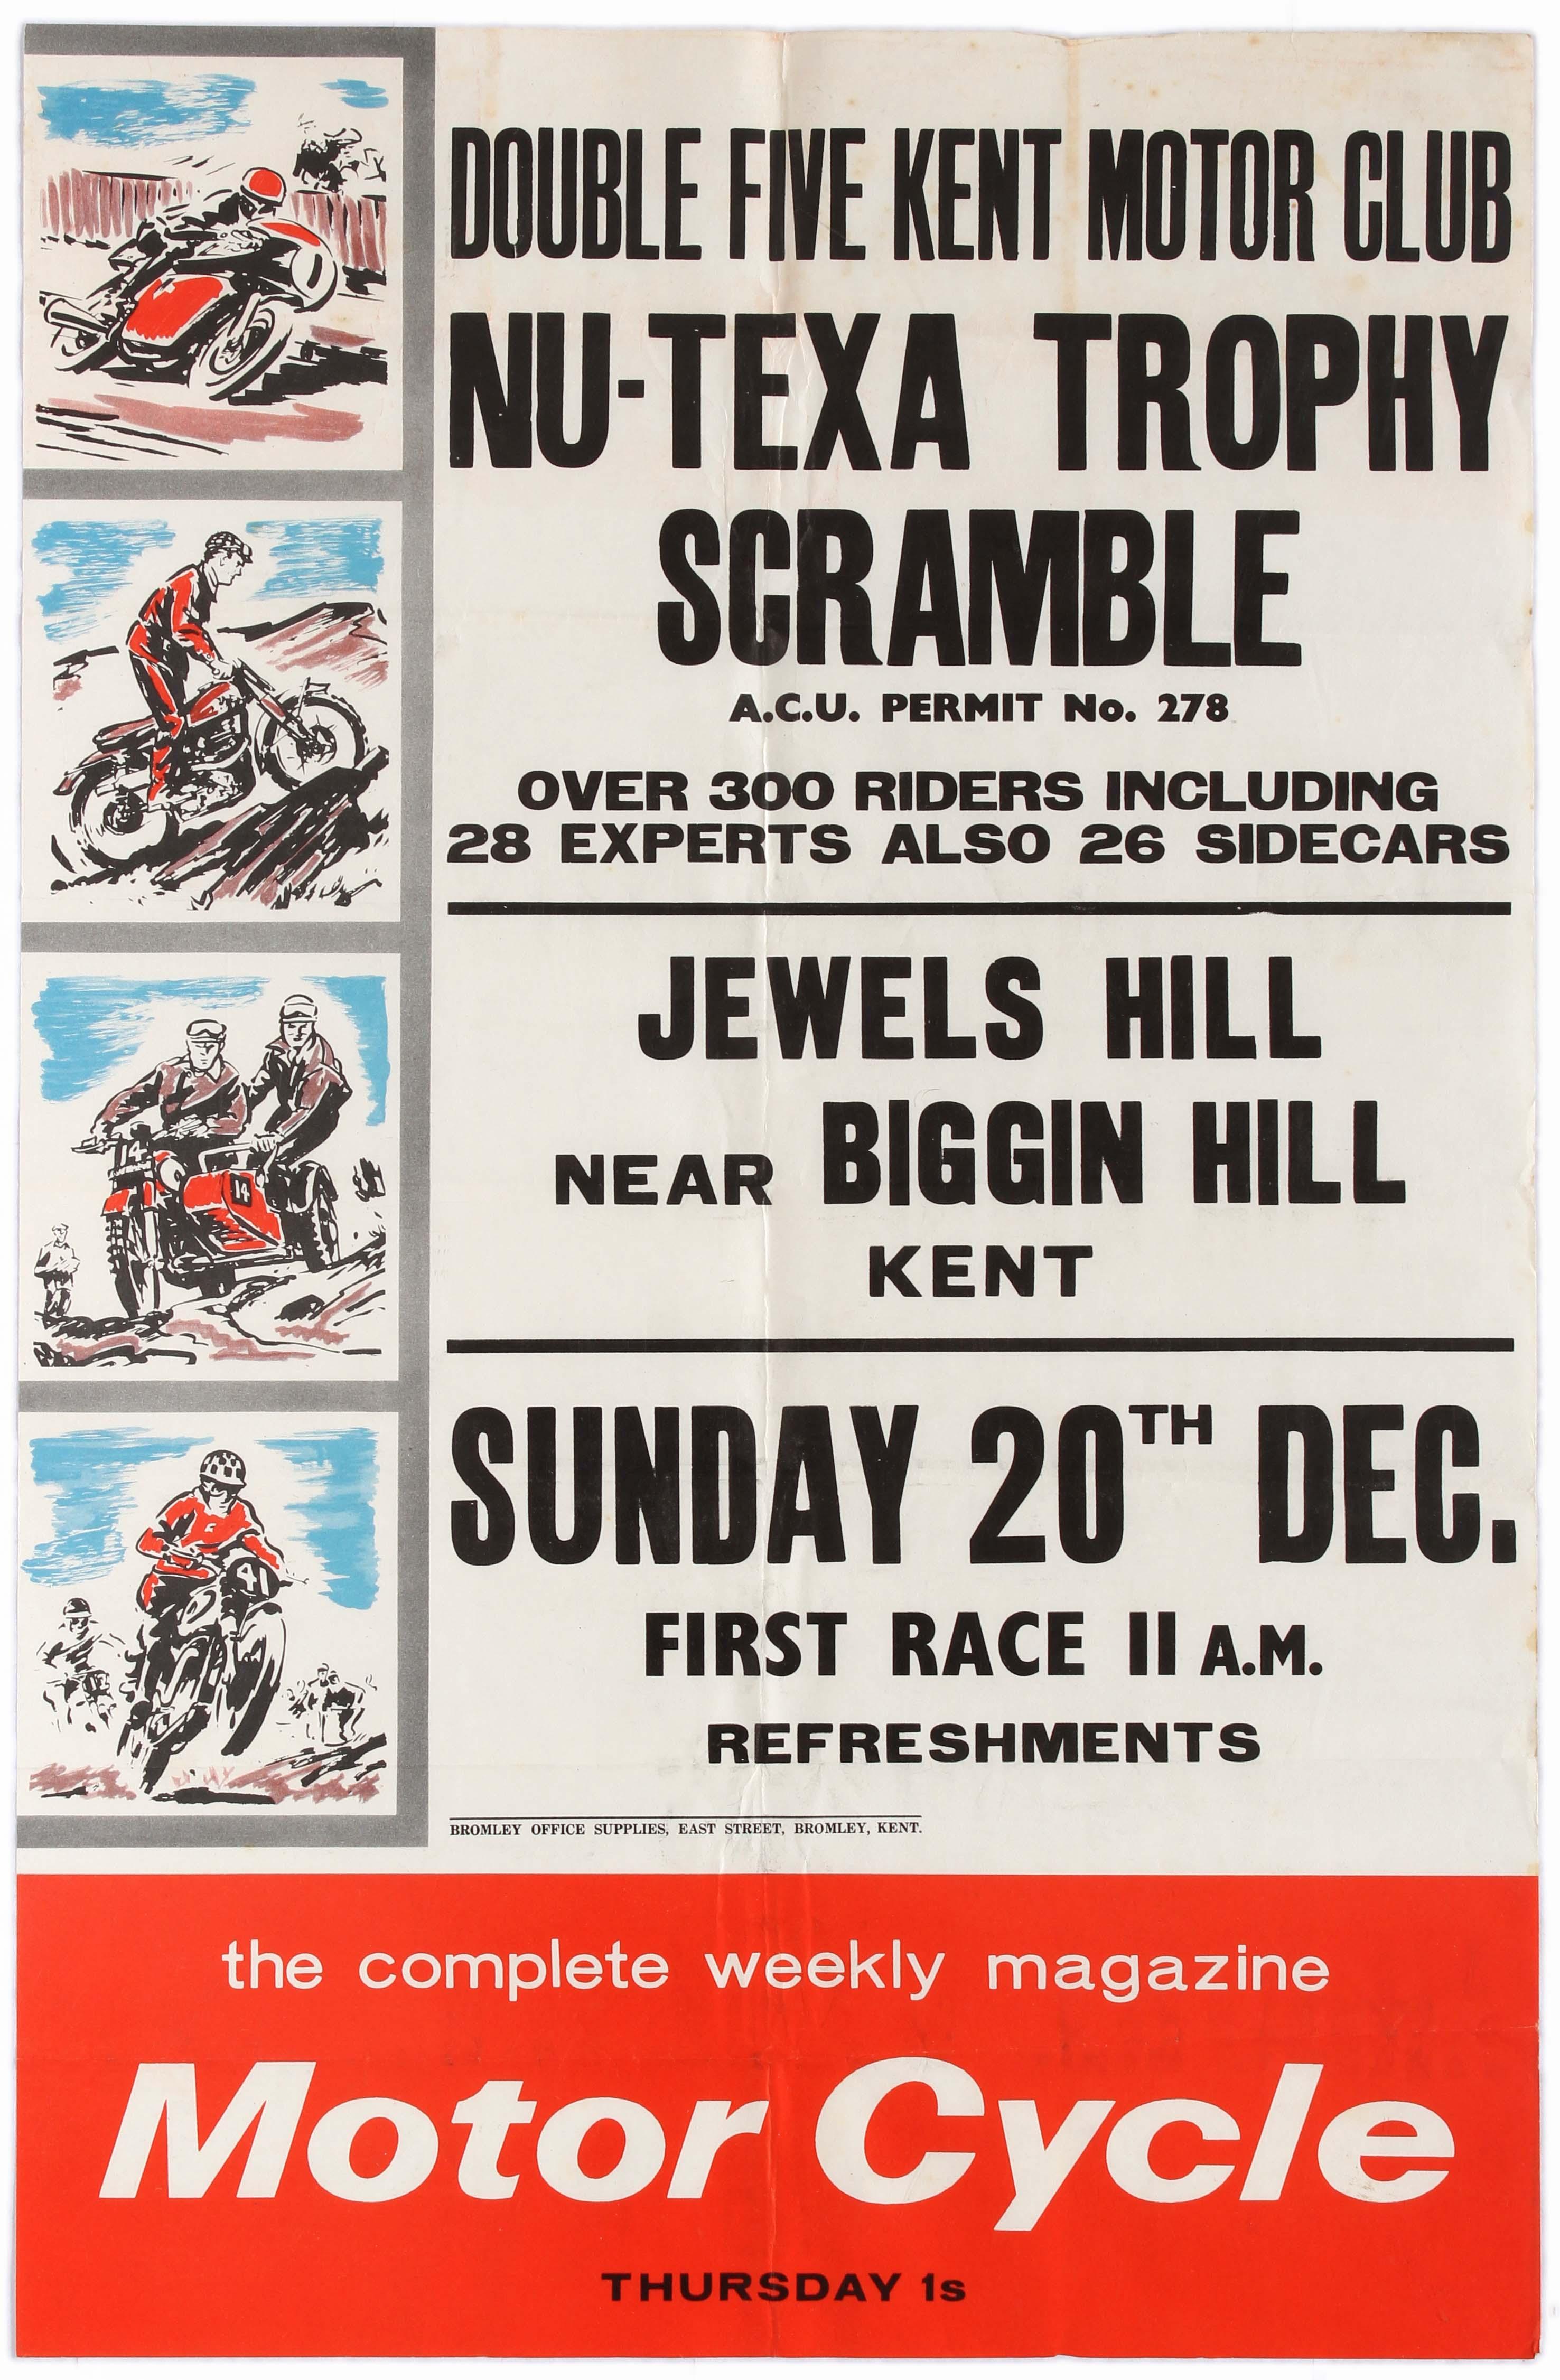 Sport Poster Nu-Texa Trophy Scramble Motorcycle Racing